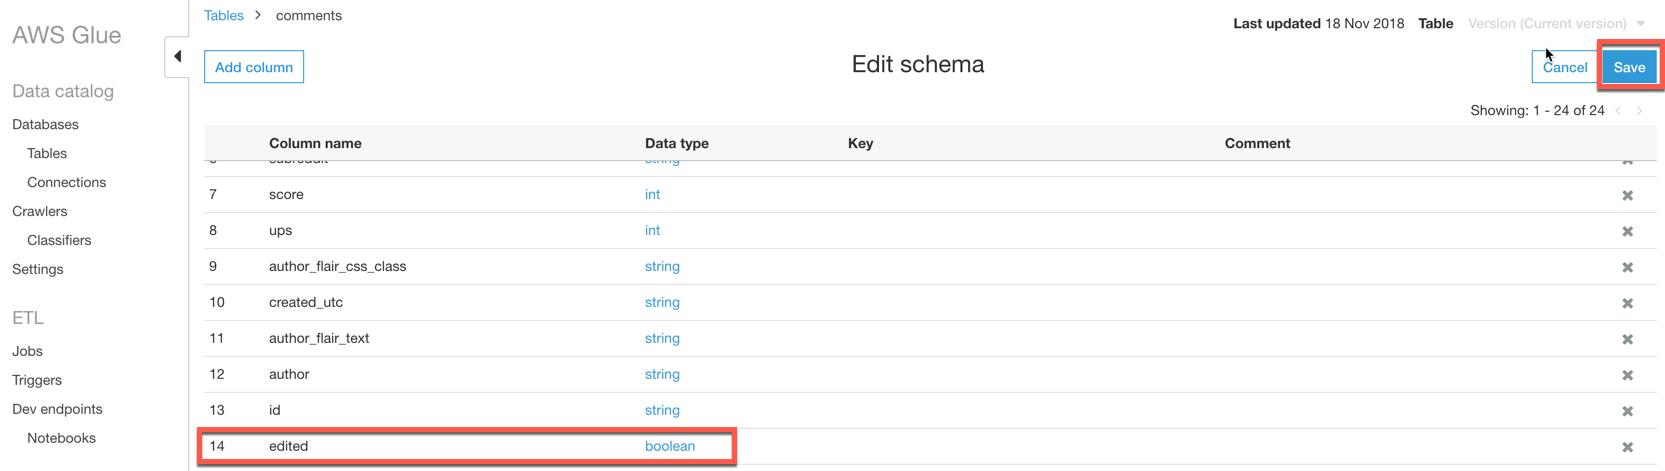 Serverless Data Analytics Using AWS Glue and Athena